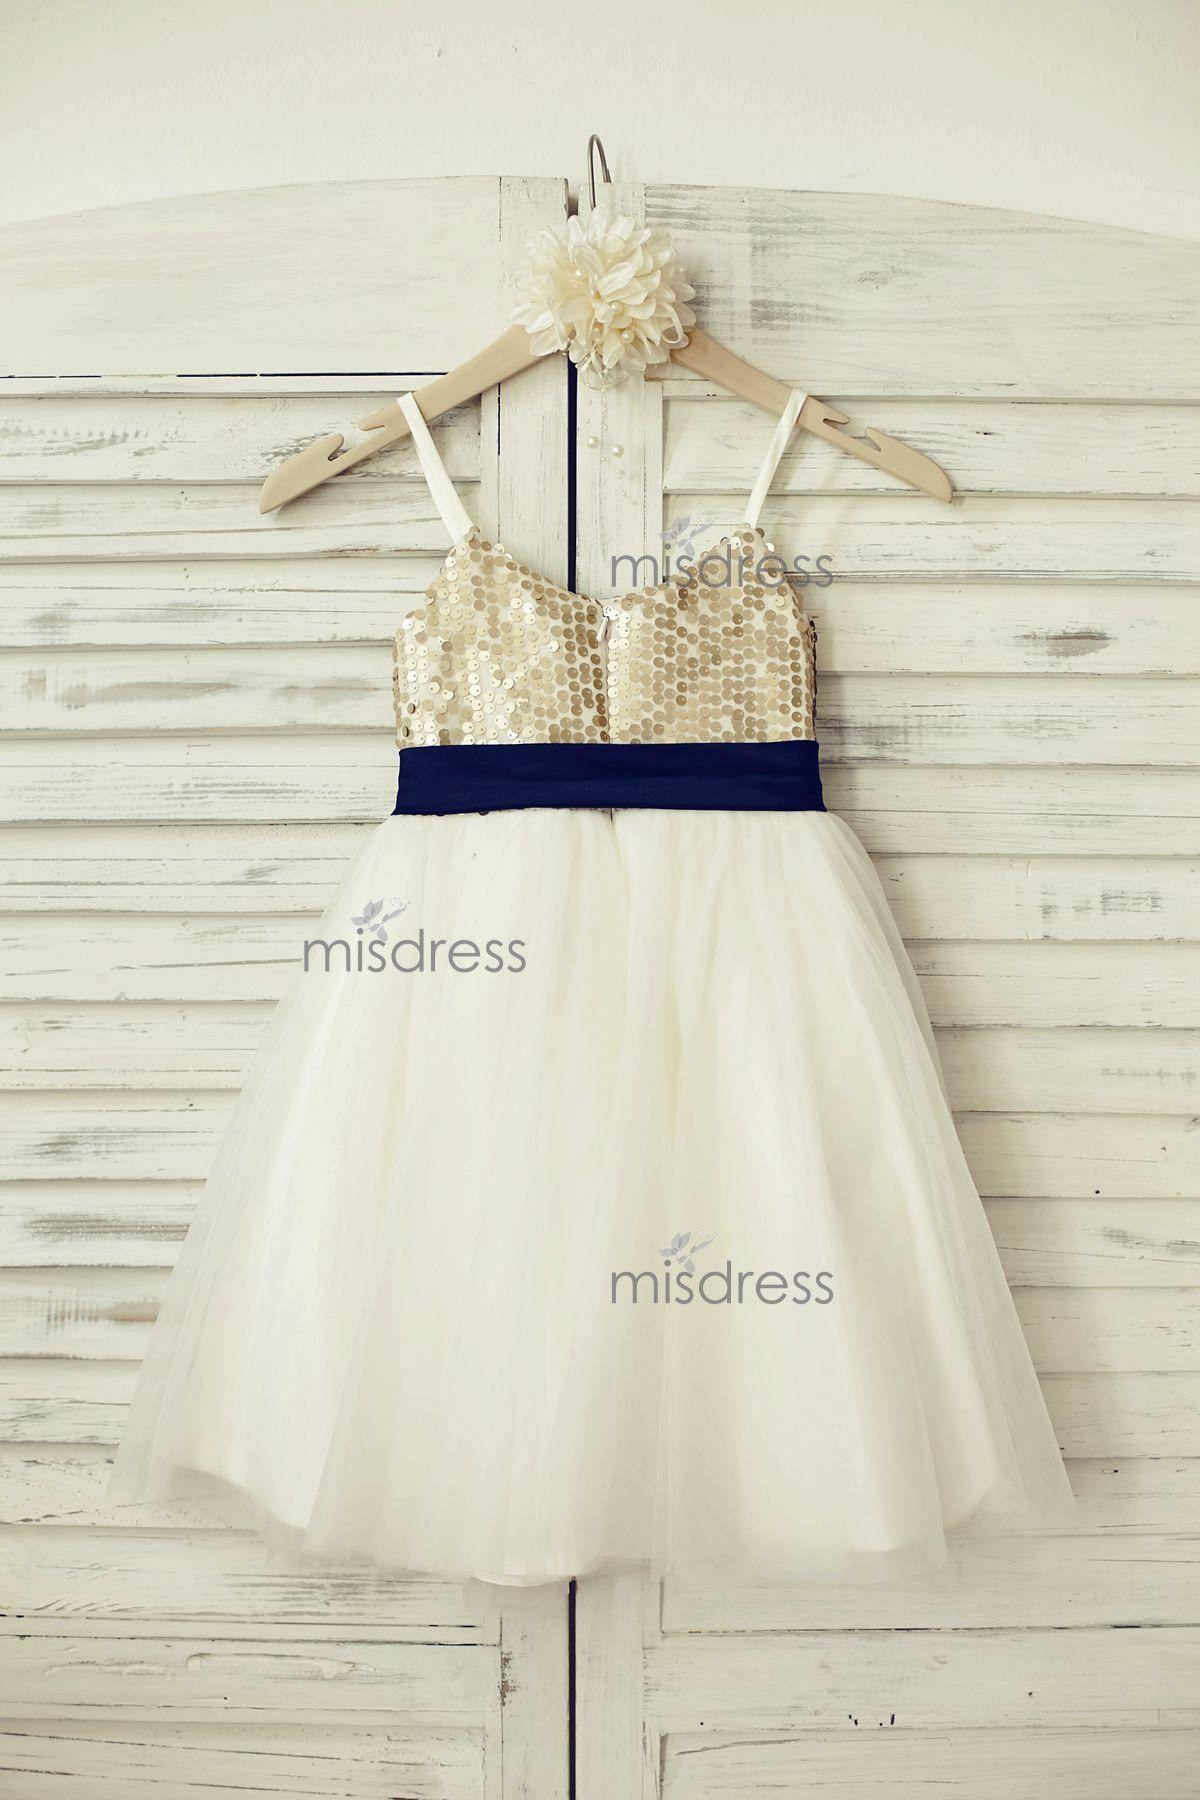 Thin Straps Champagne Sequin Tulle Flower Girl Dress with navy blue belt --- Misdress.com